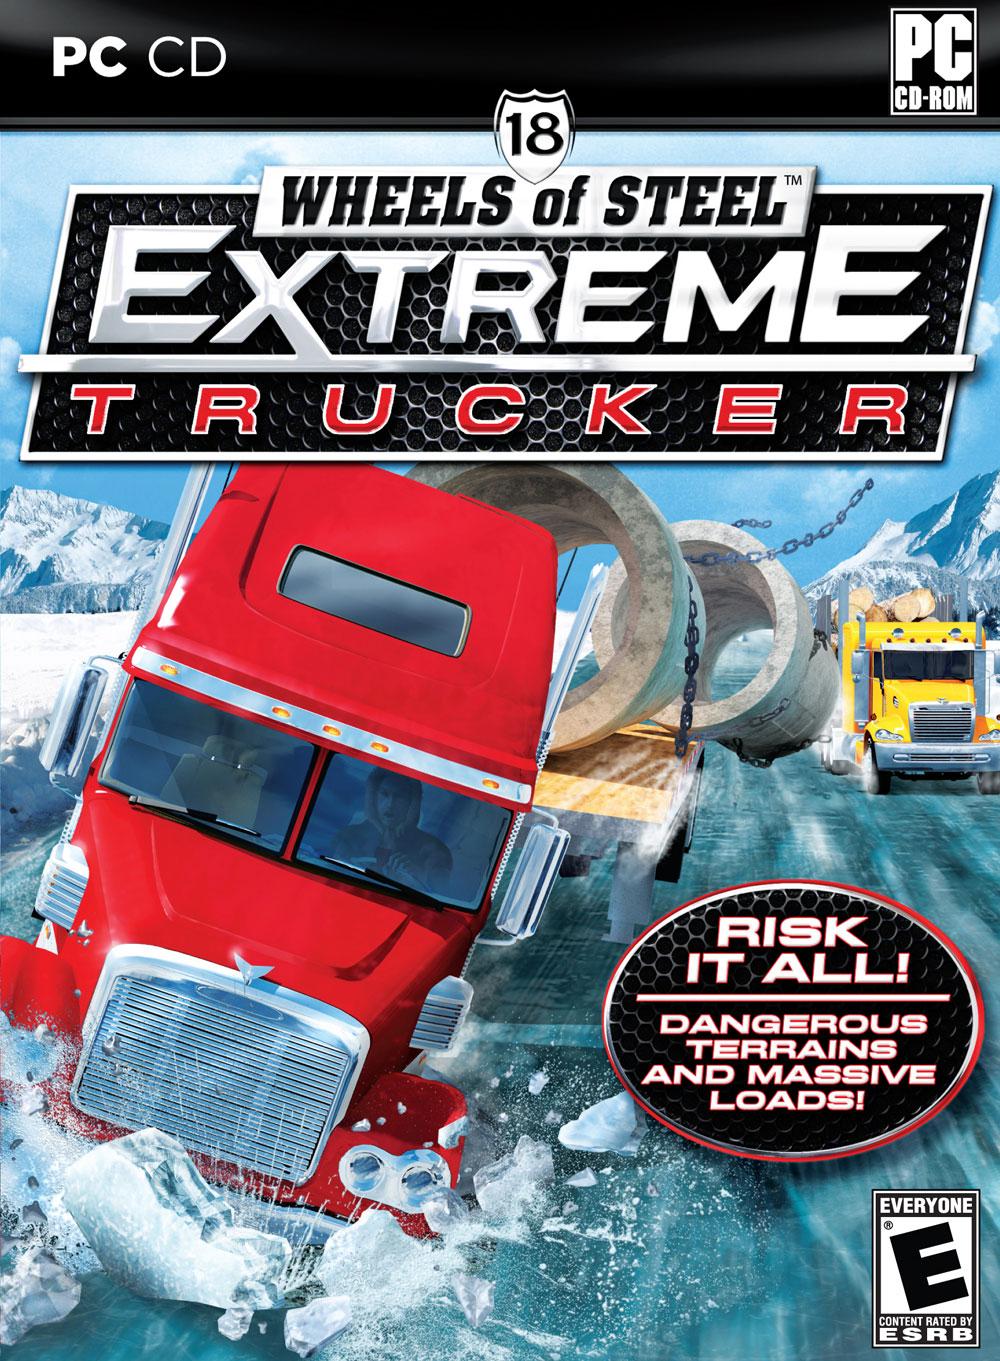 18 Wheels of Steel: Extreme Trucker (2009)